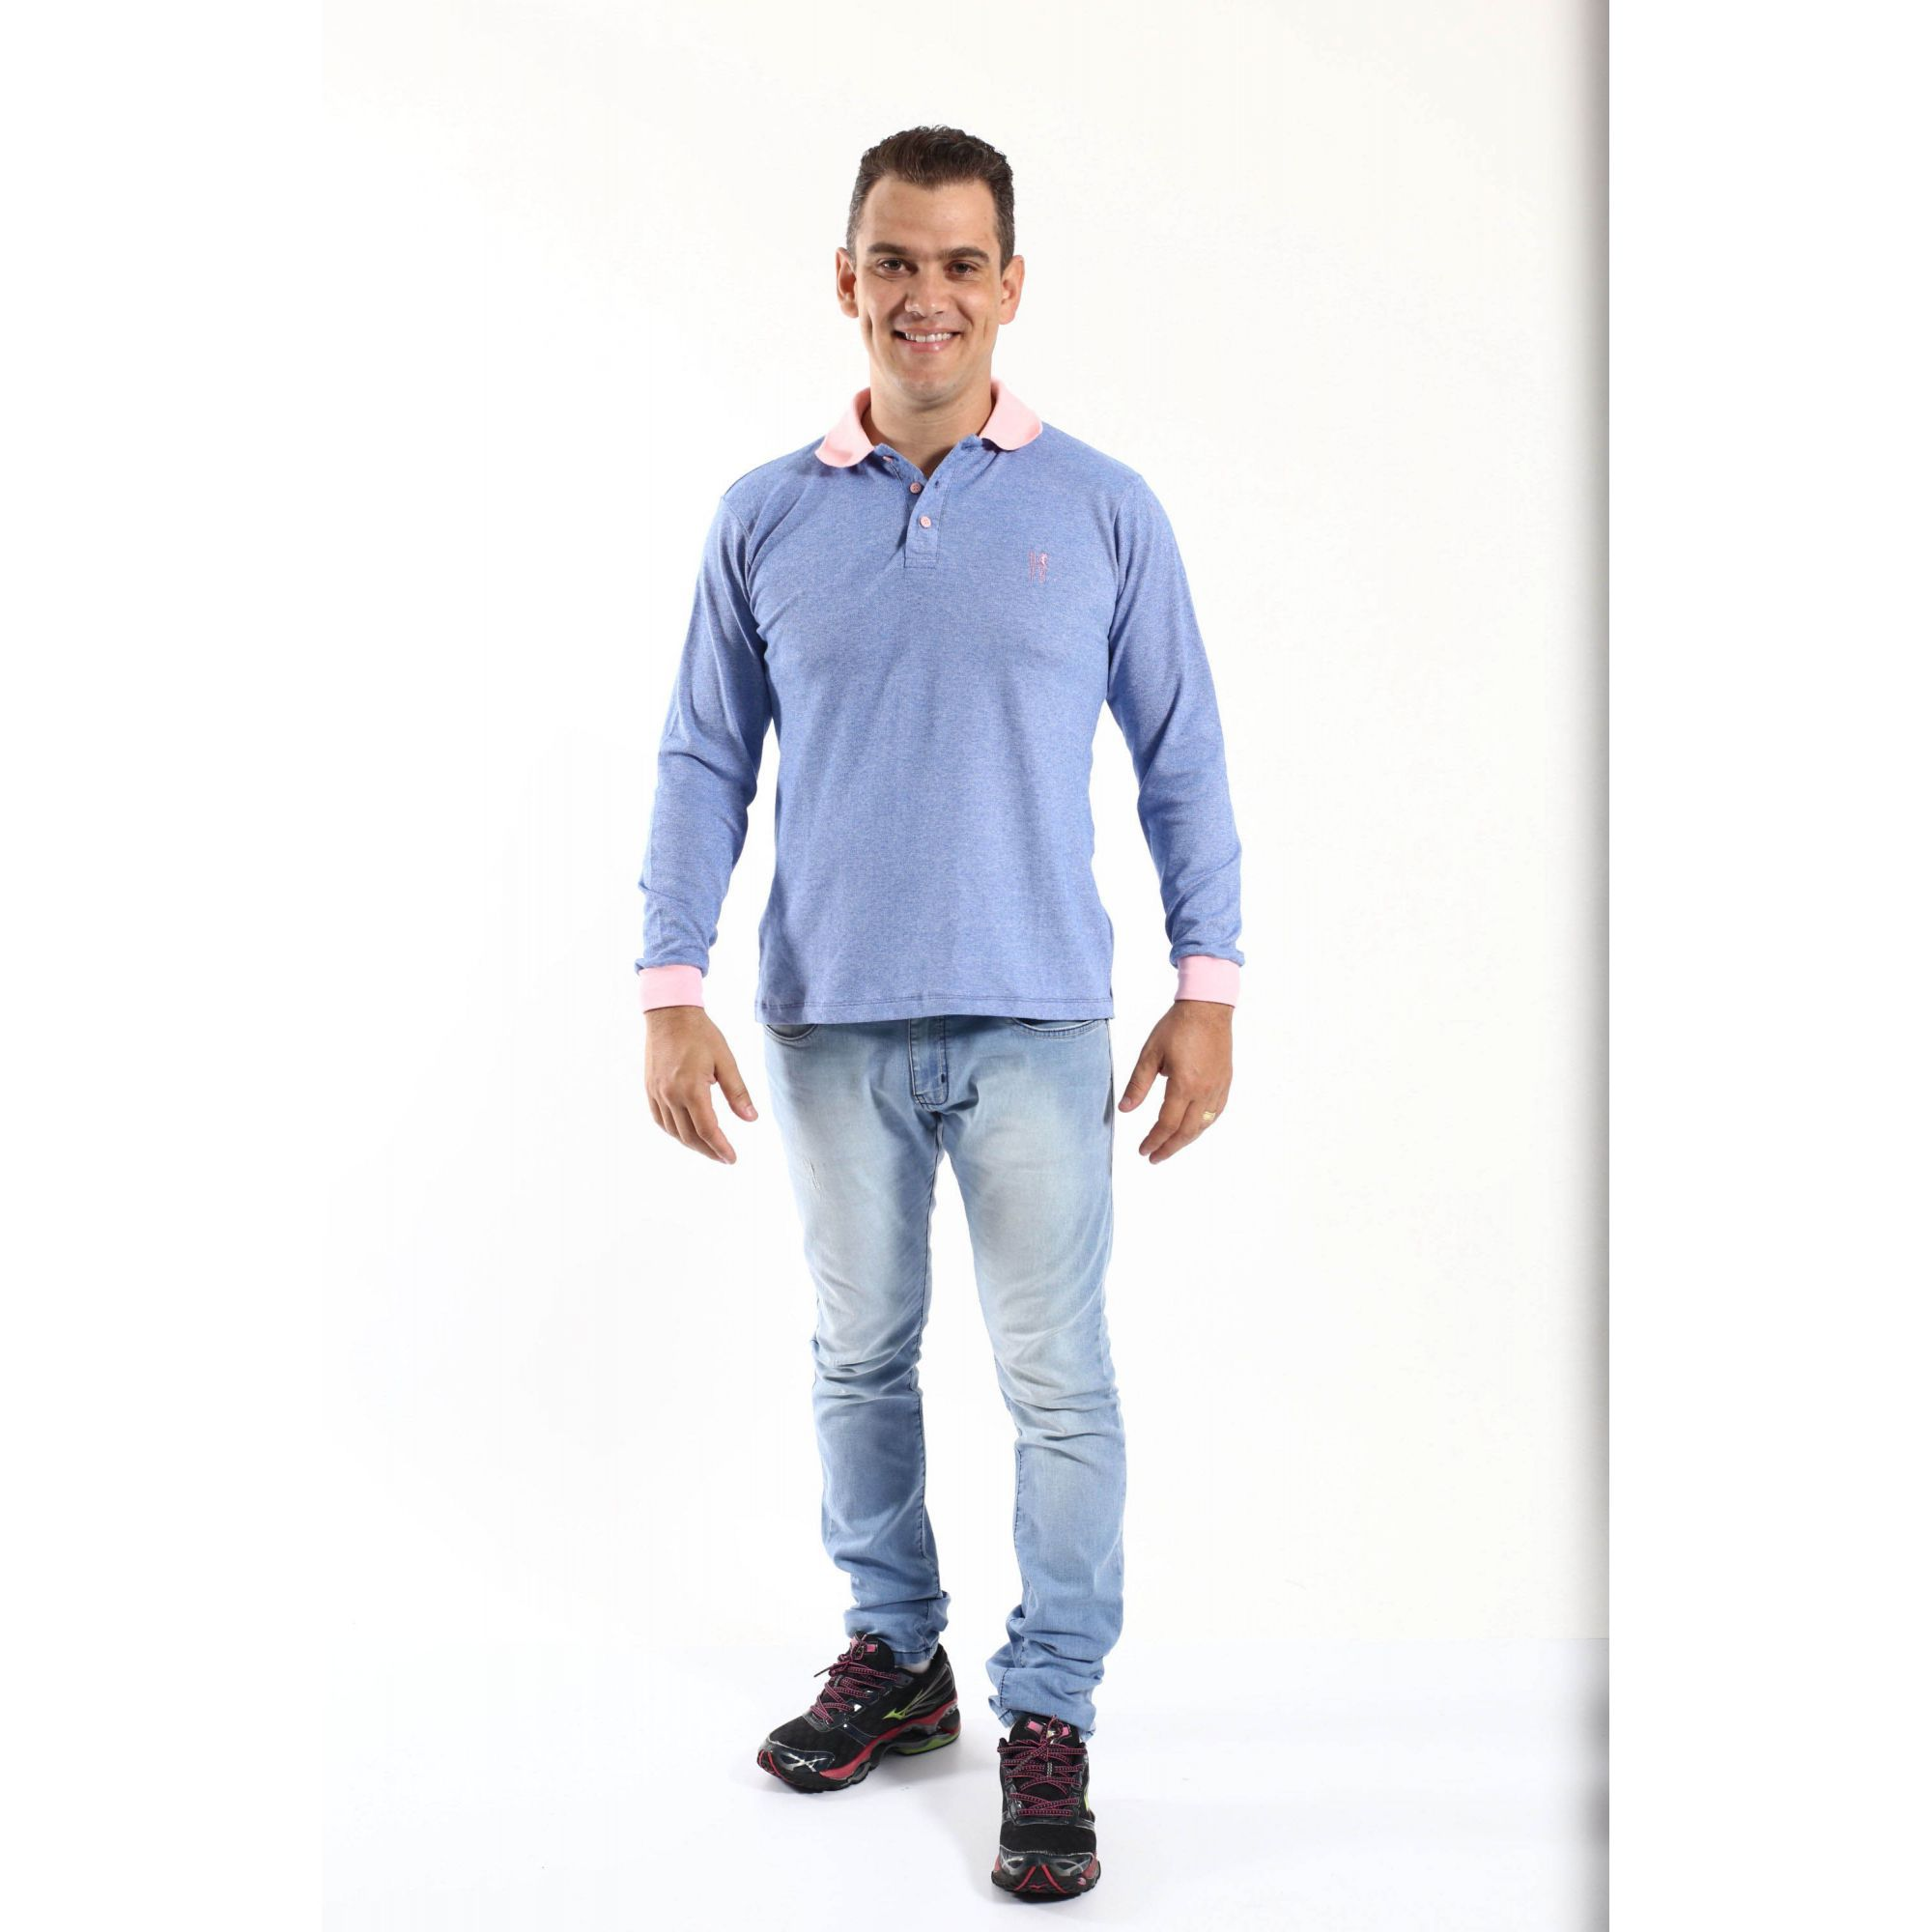 Camisa Polo Azul Manga Longa  - Heitor Fashion Brazil